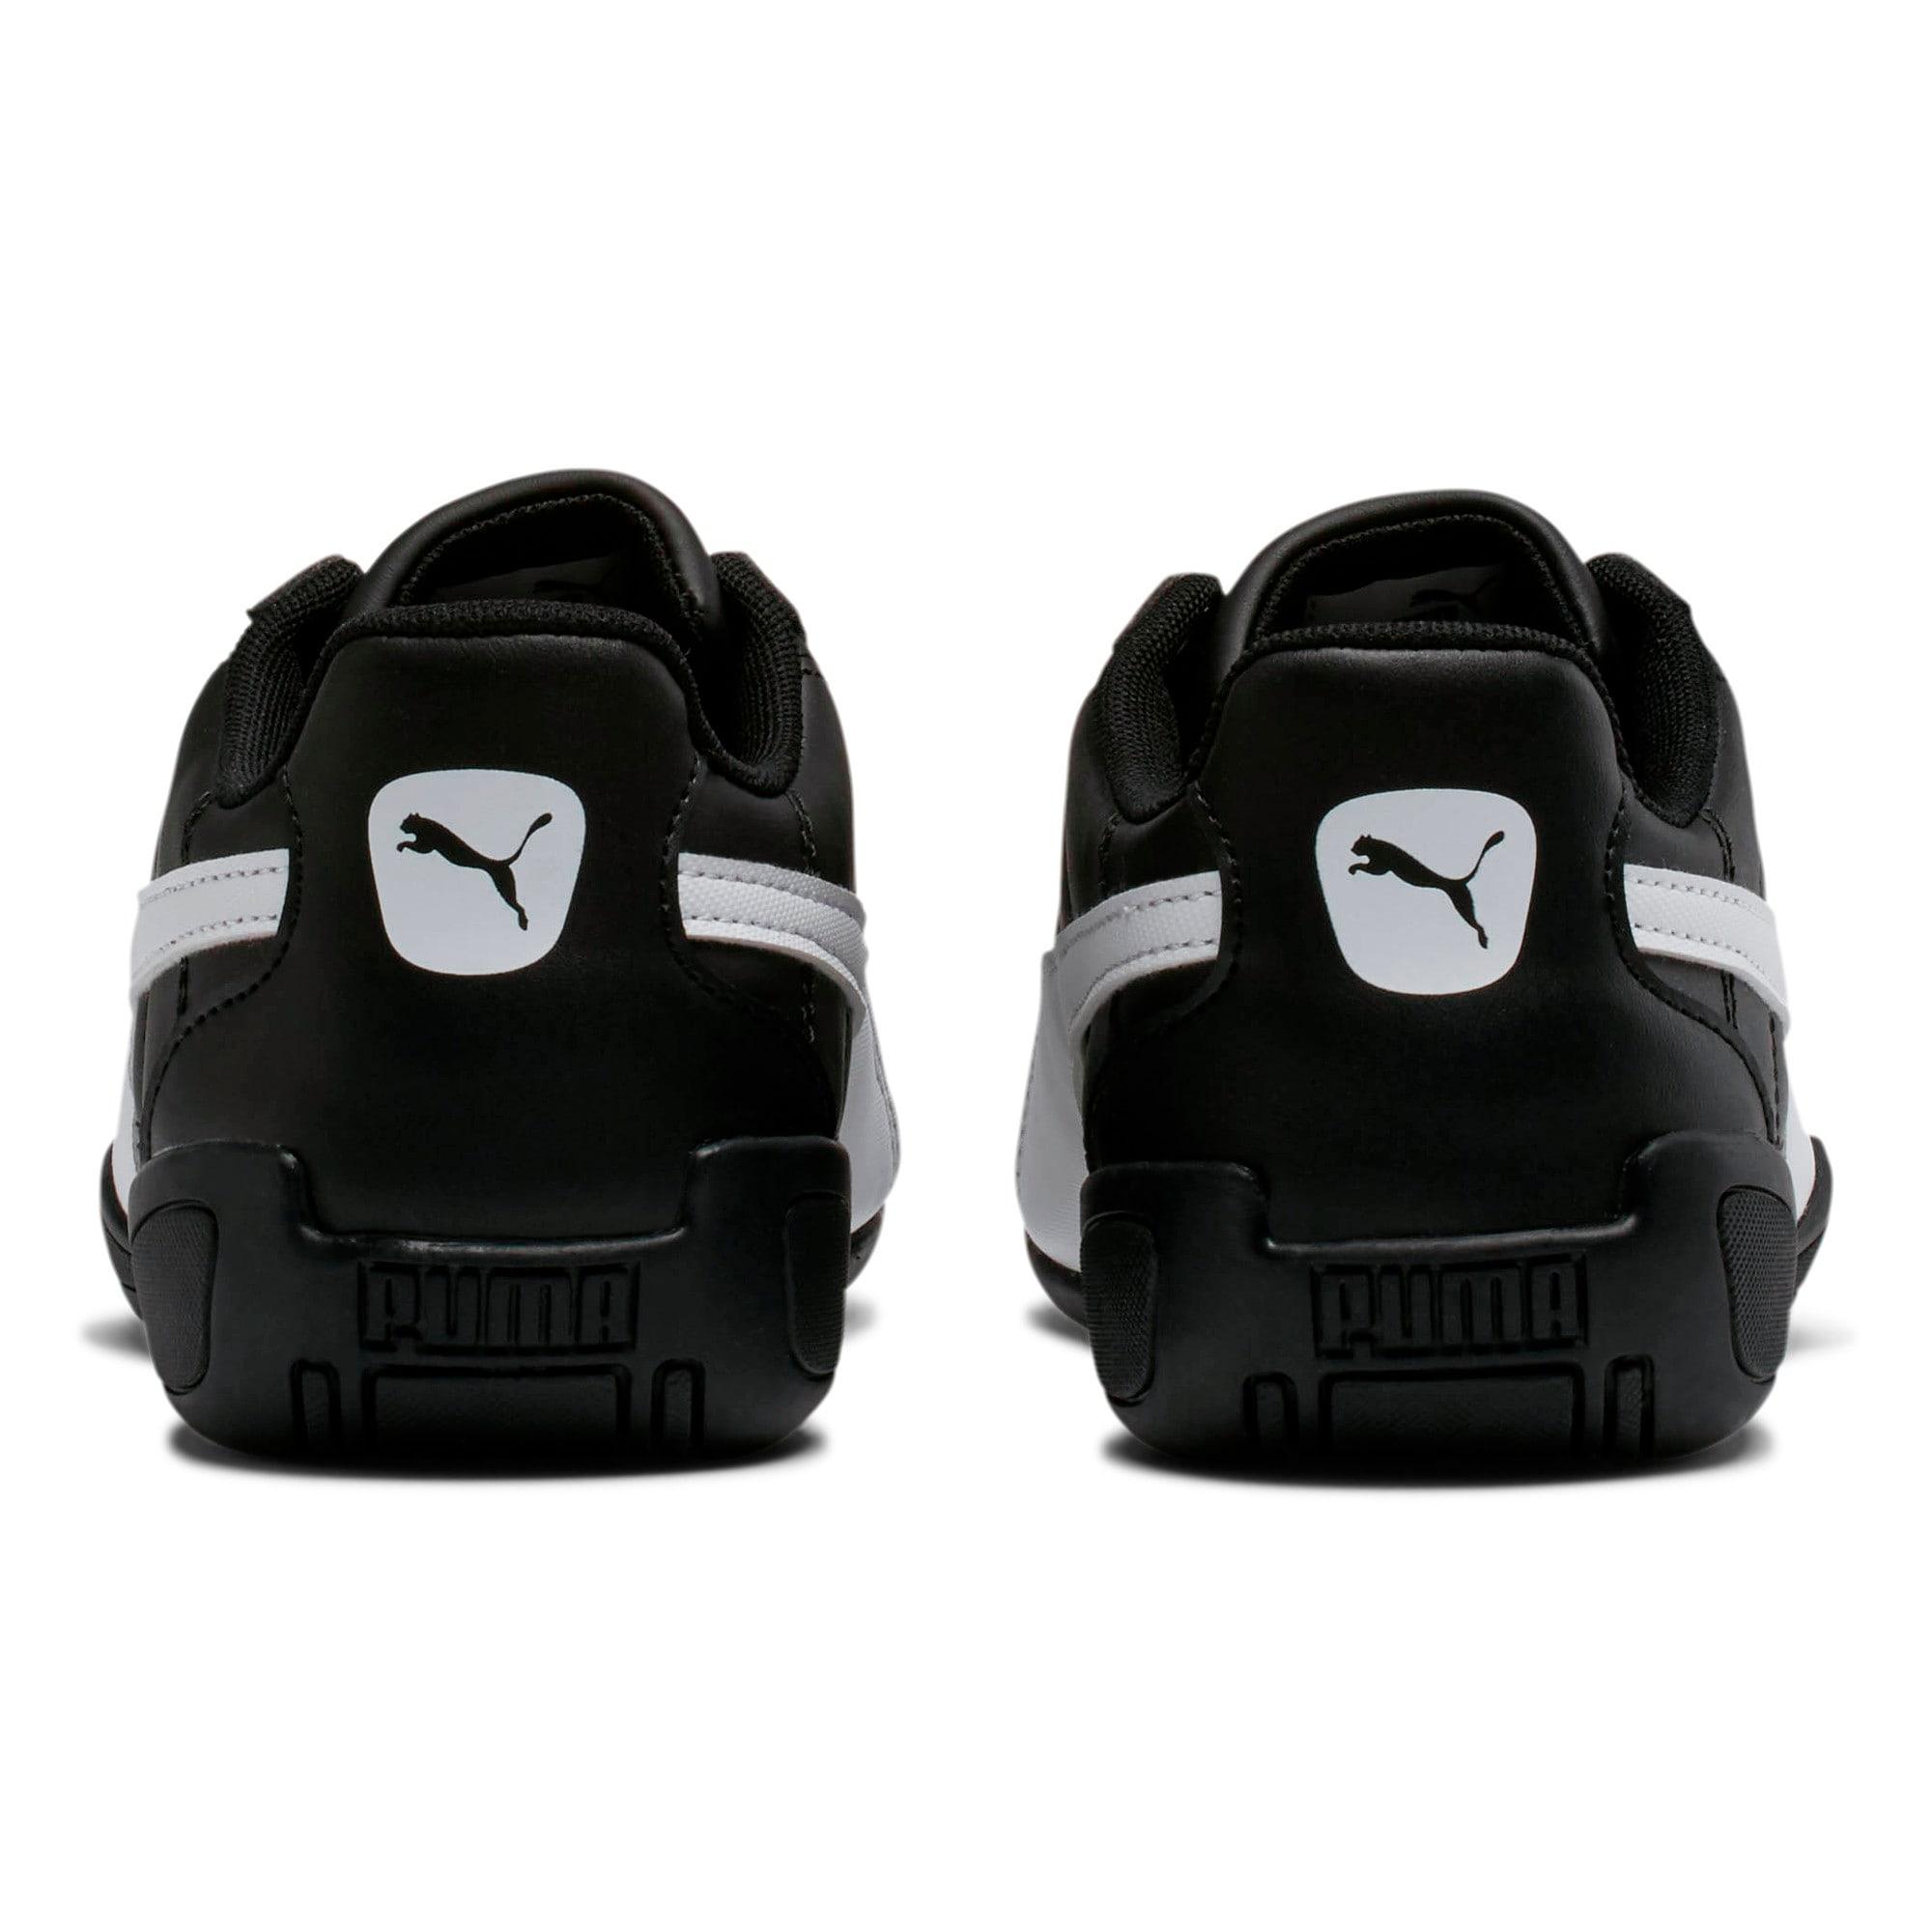 Thumbnail 4 of Tune Cat 3 Shoes JR, Puma Black-Puma White, medium